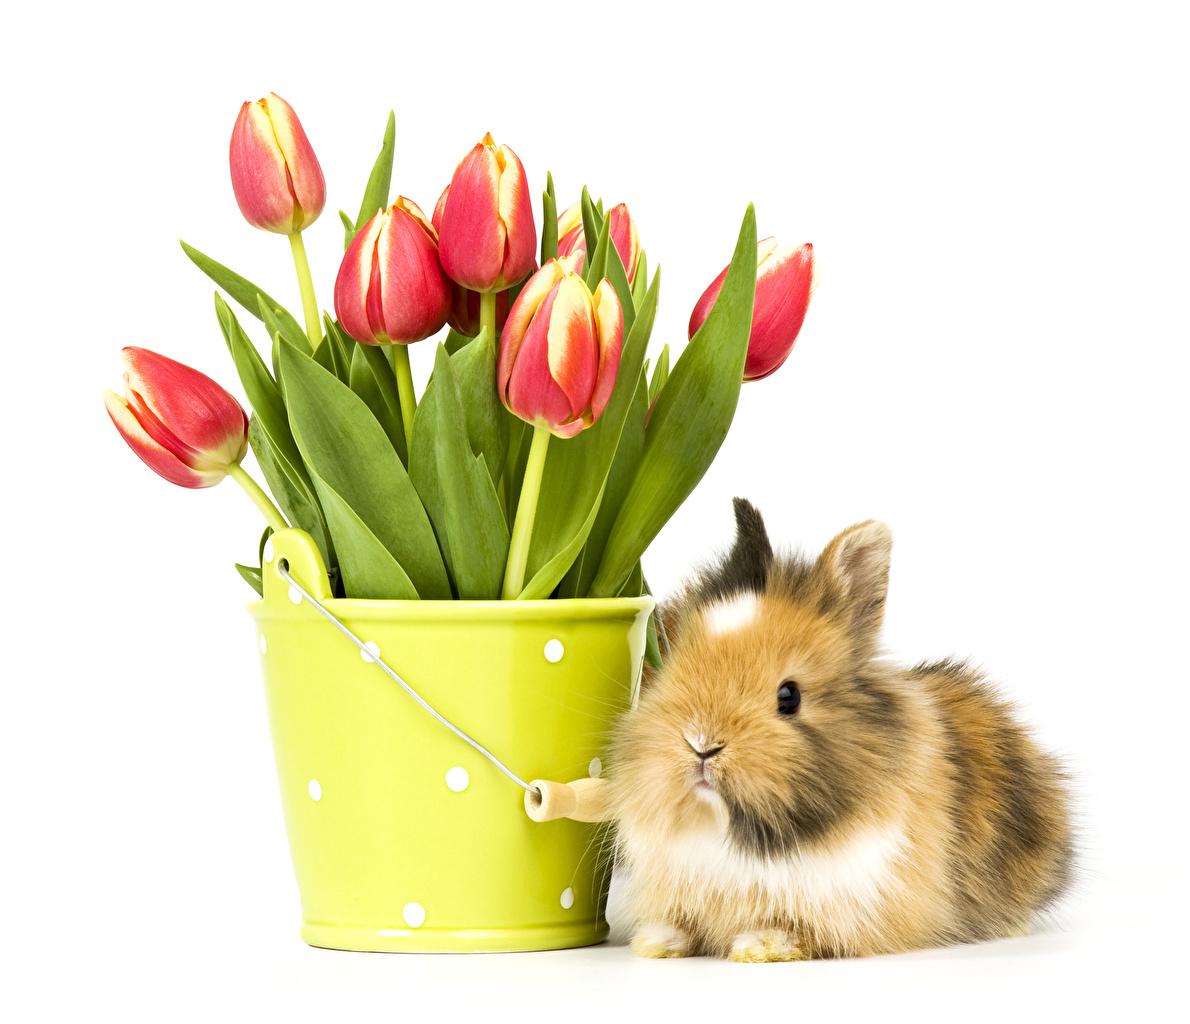 Pictures rabbit Tulips Bucket flower Animals White background Rabbits tulip Flowers animal